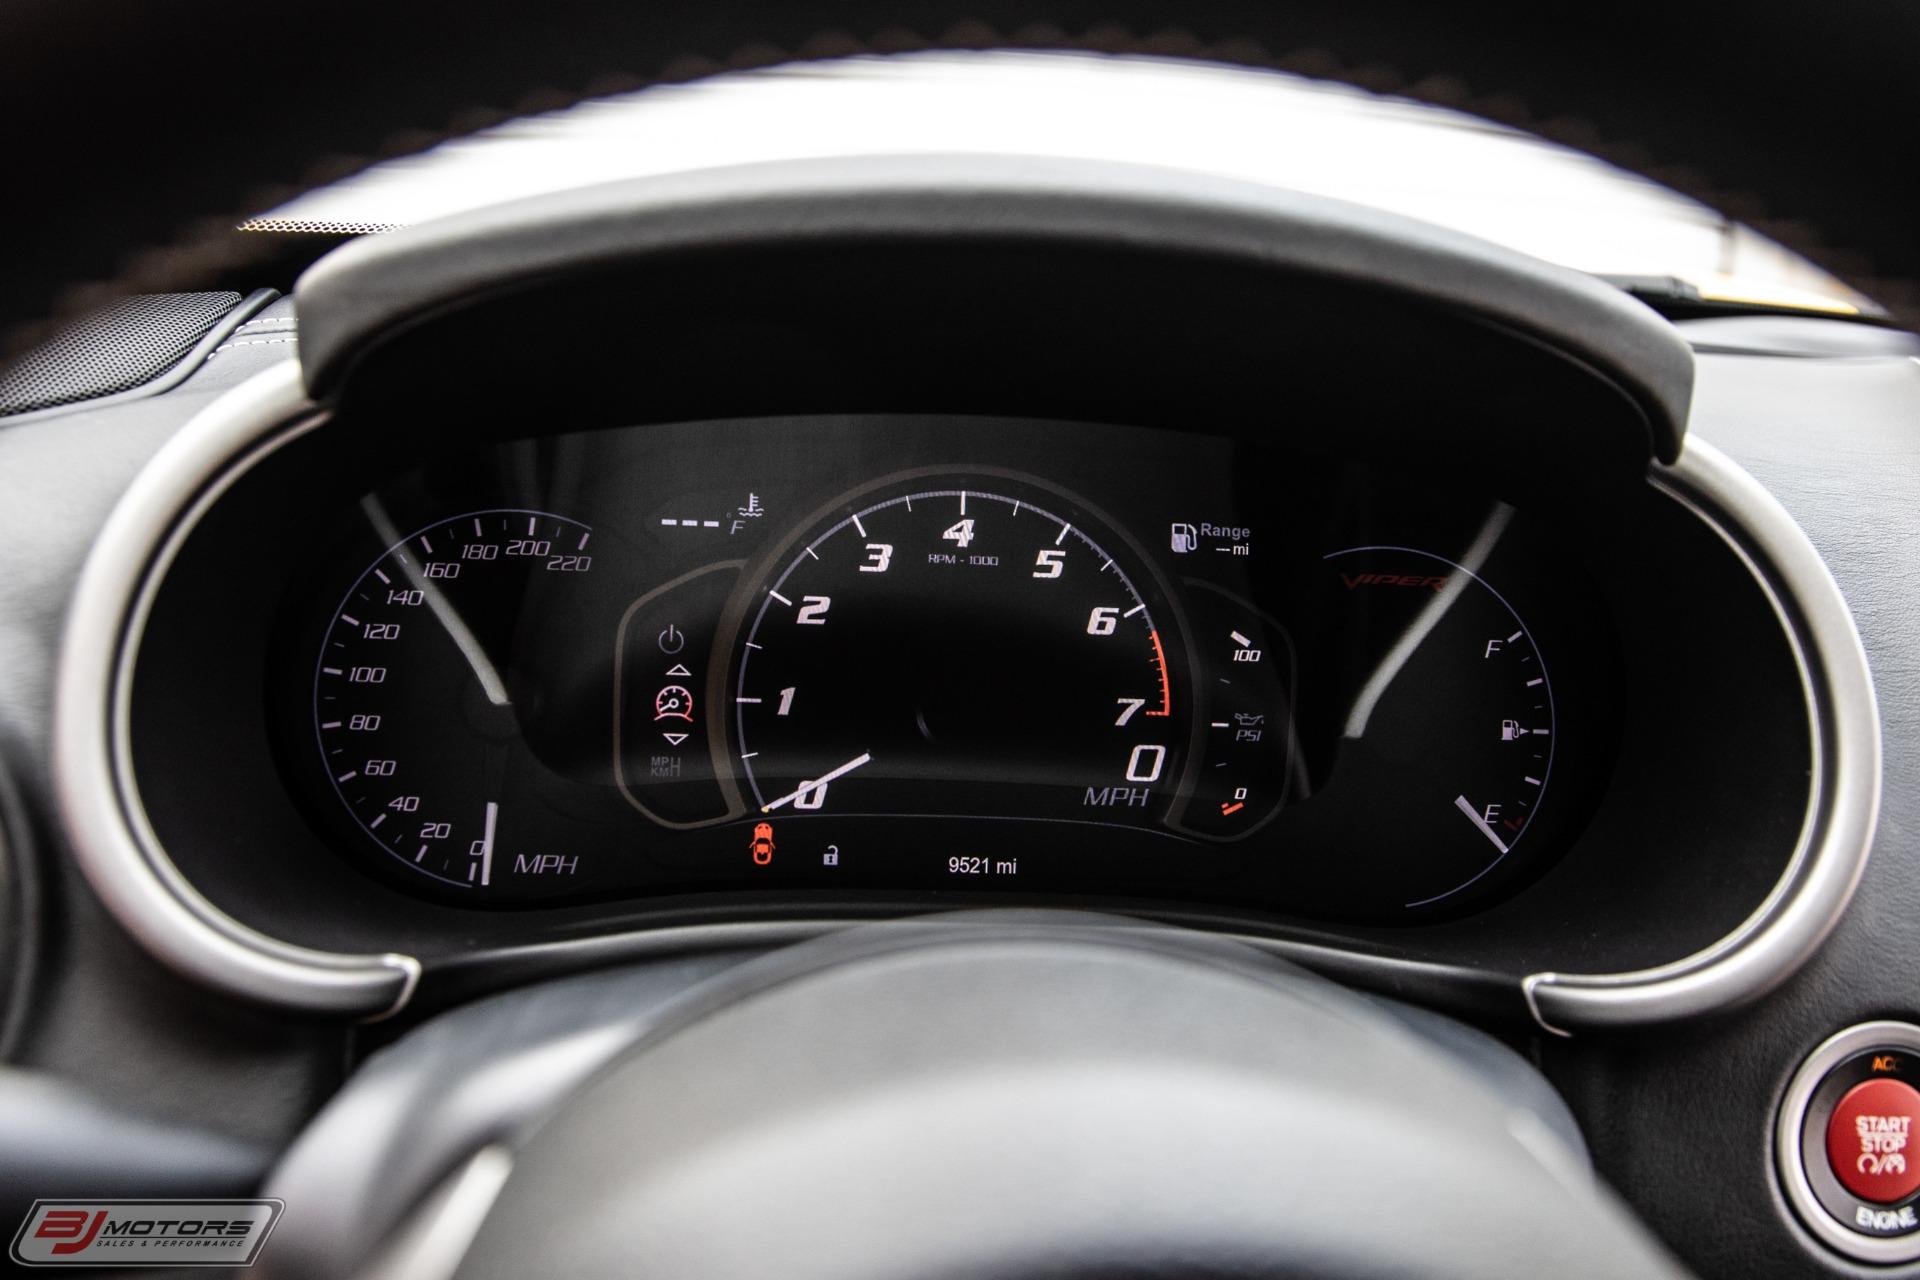 Used-2013-Dodge-Viper-GTS